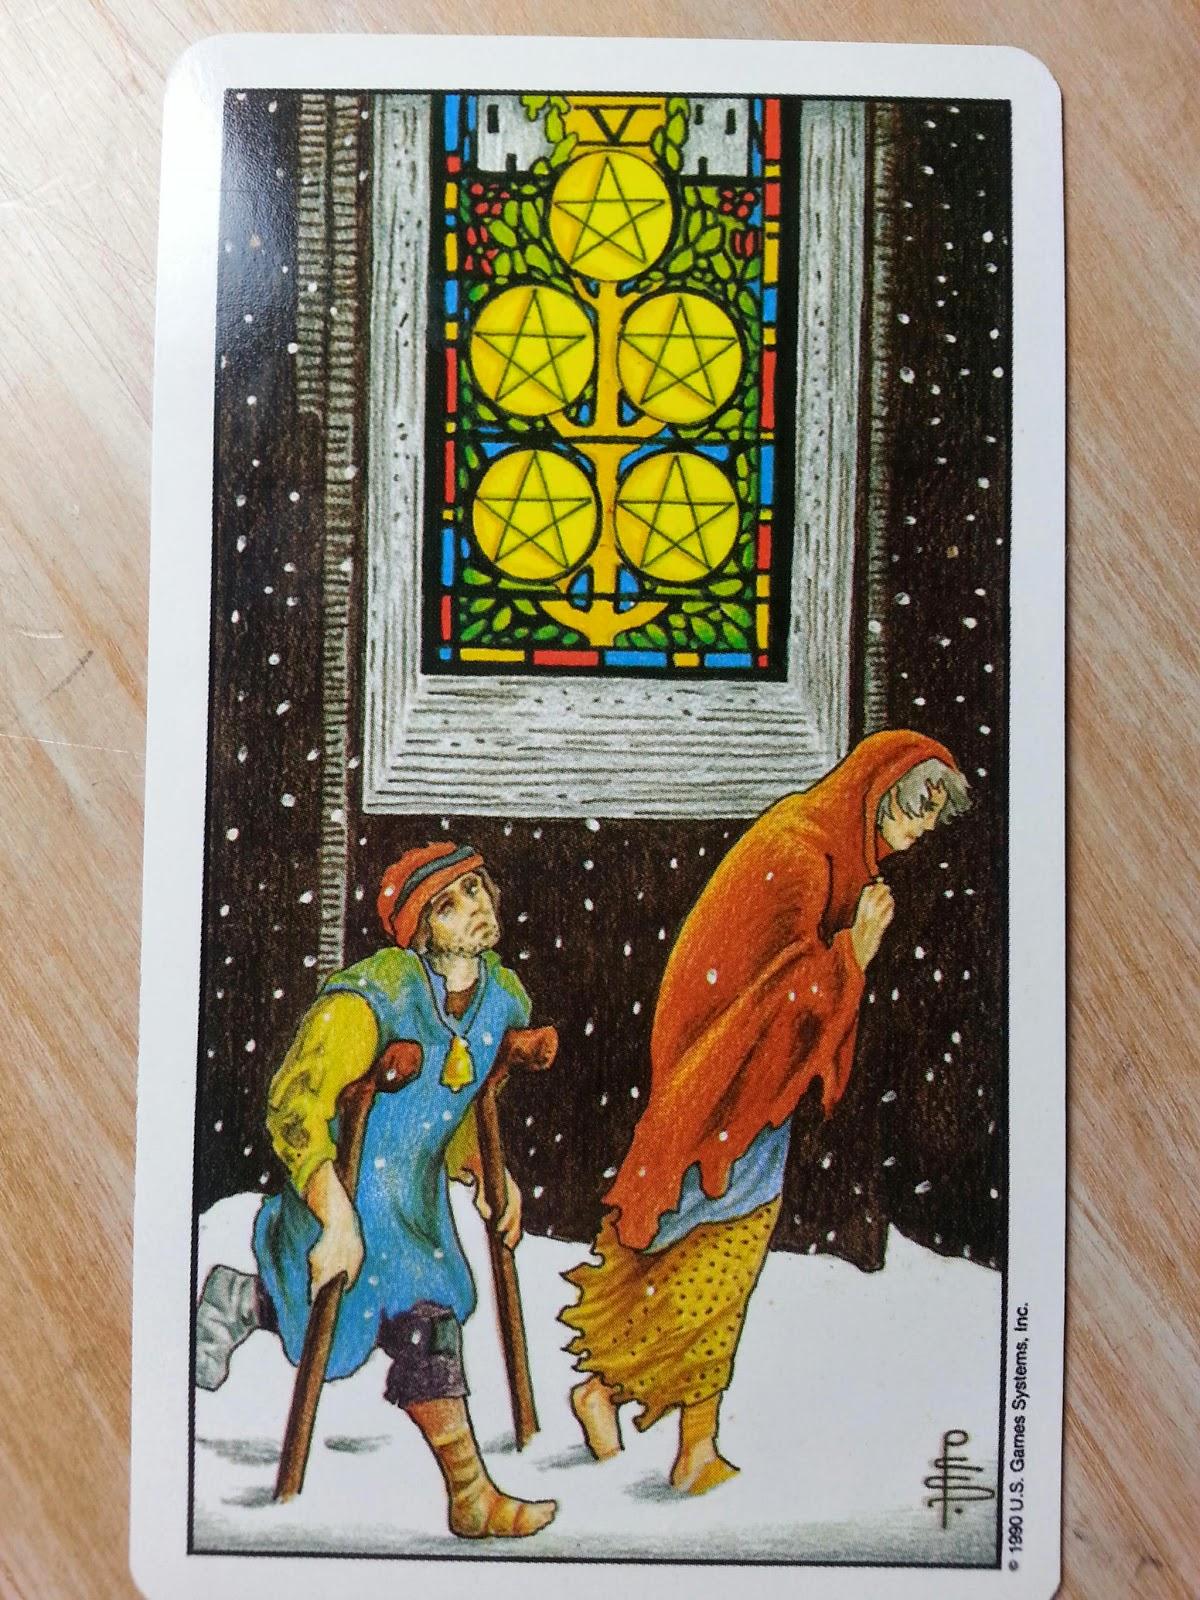 Universal Waite Tarot Deck By Mary Hanson Roberts Arthur: Healing Rain On A Sunny Day: Universal Waite Tarot Review